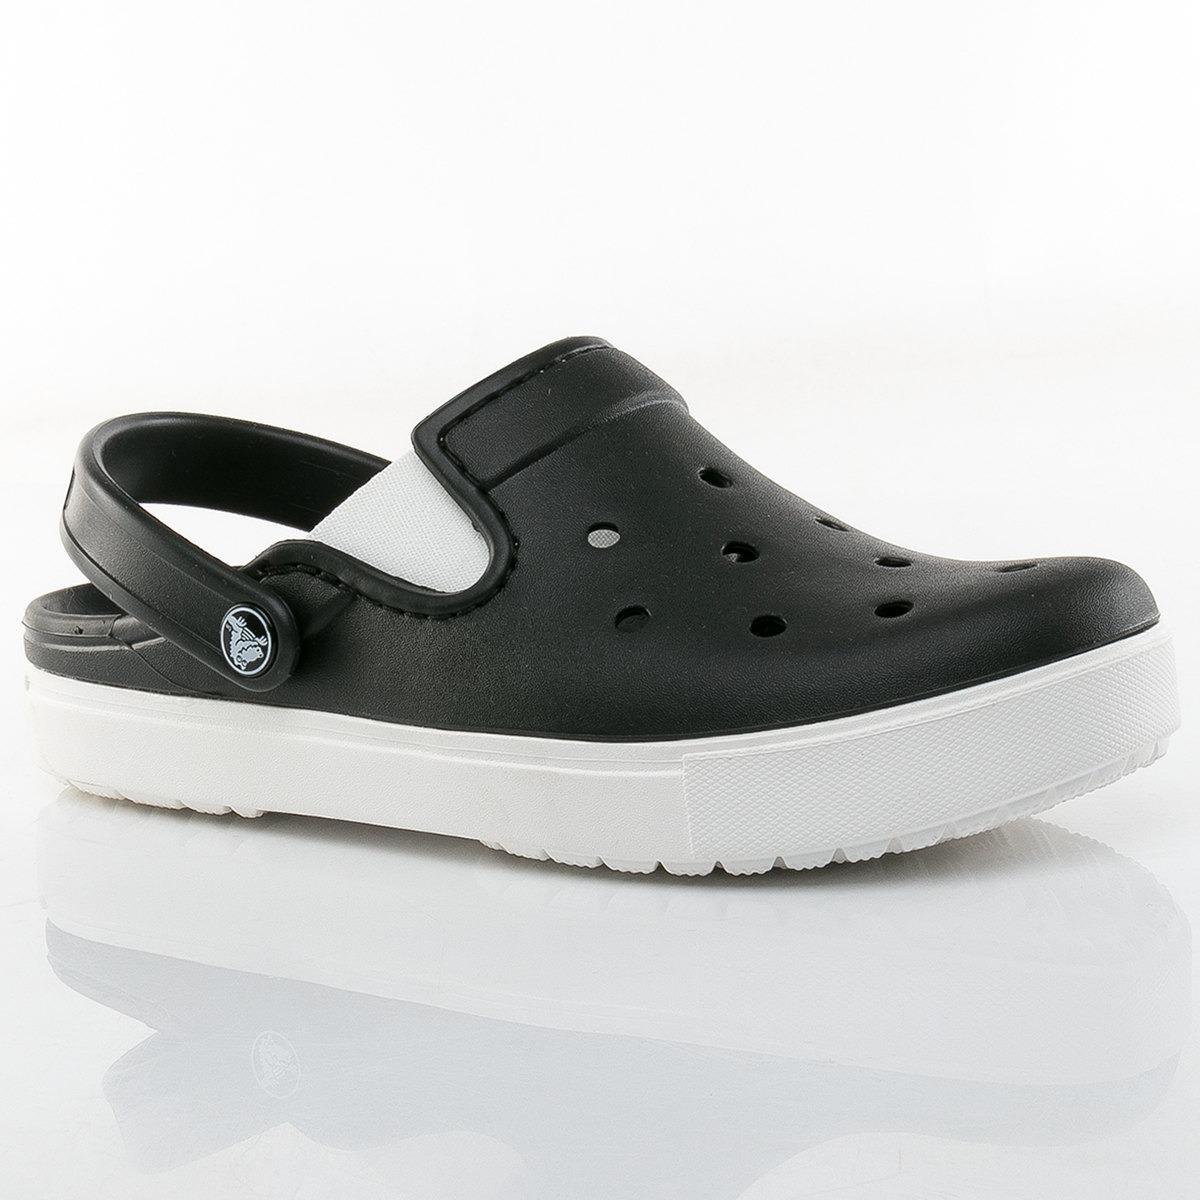 f7f0dc4fe4e suecos citilane clog crocs team sport tienda oficial. Cargando zoom.